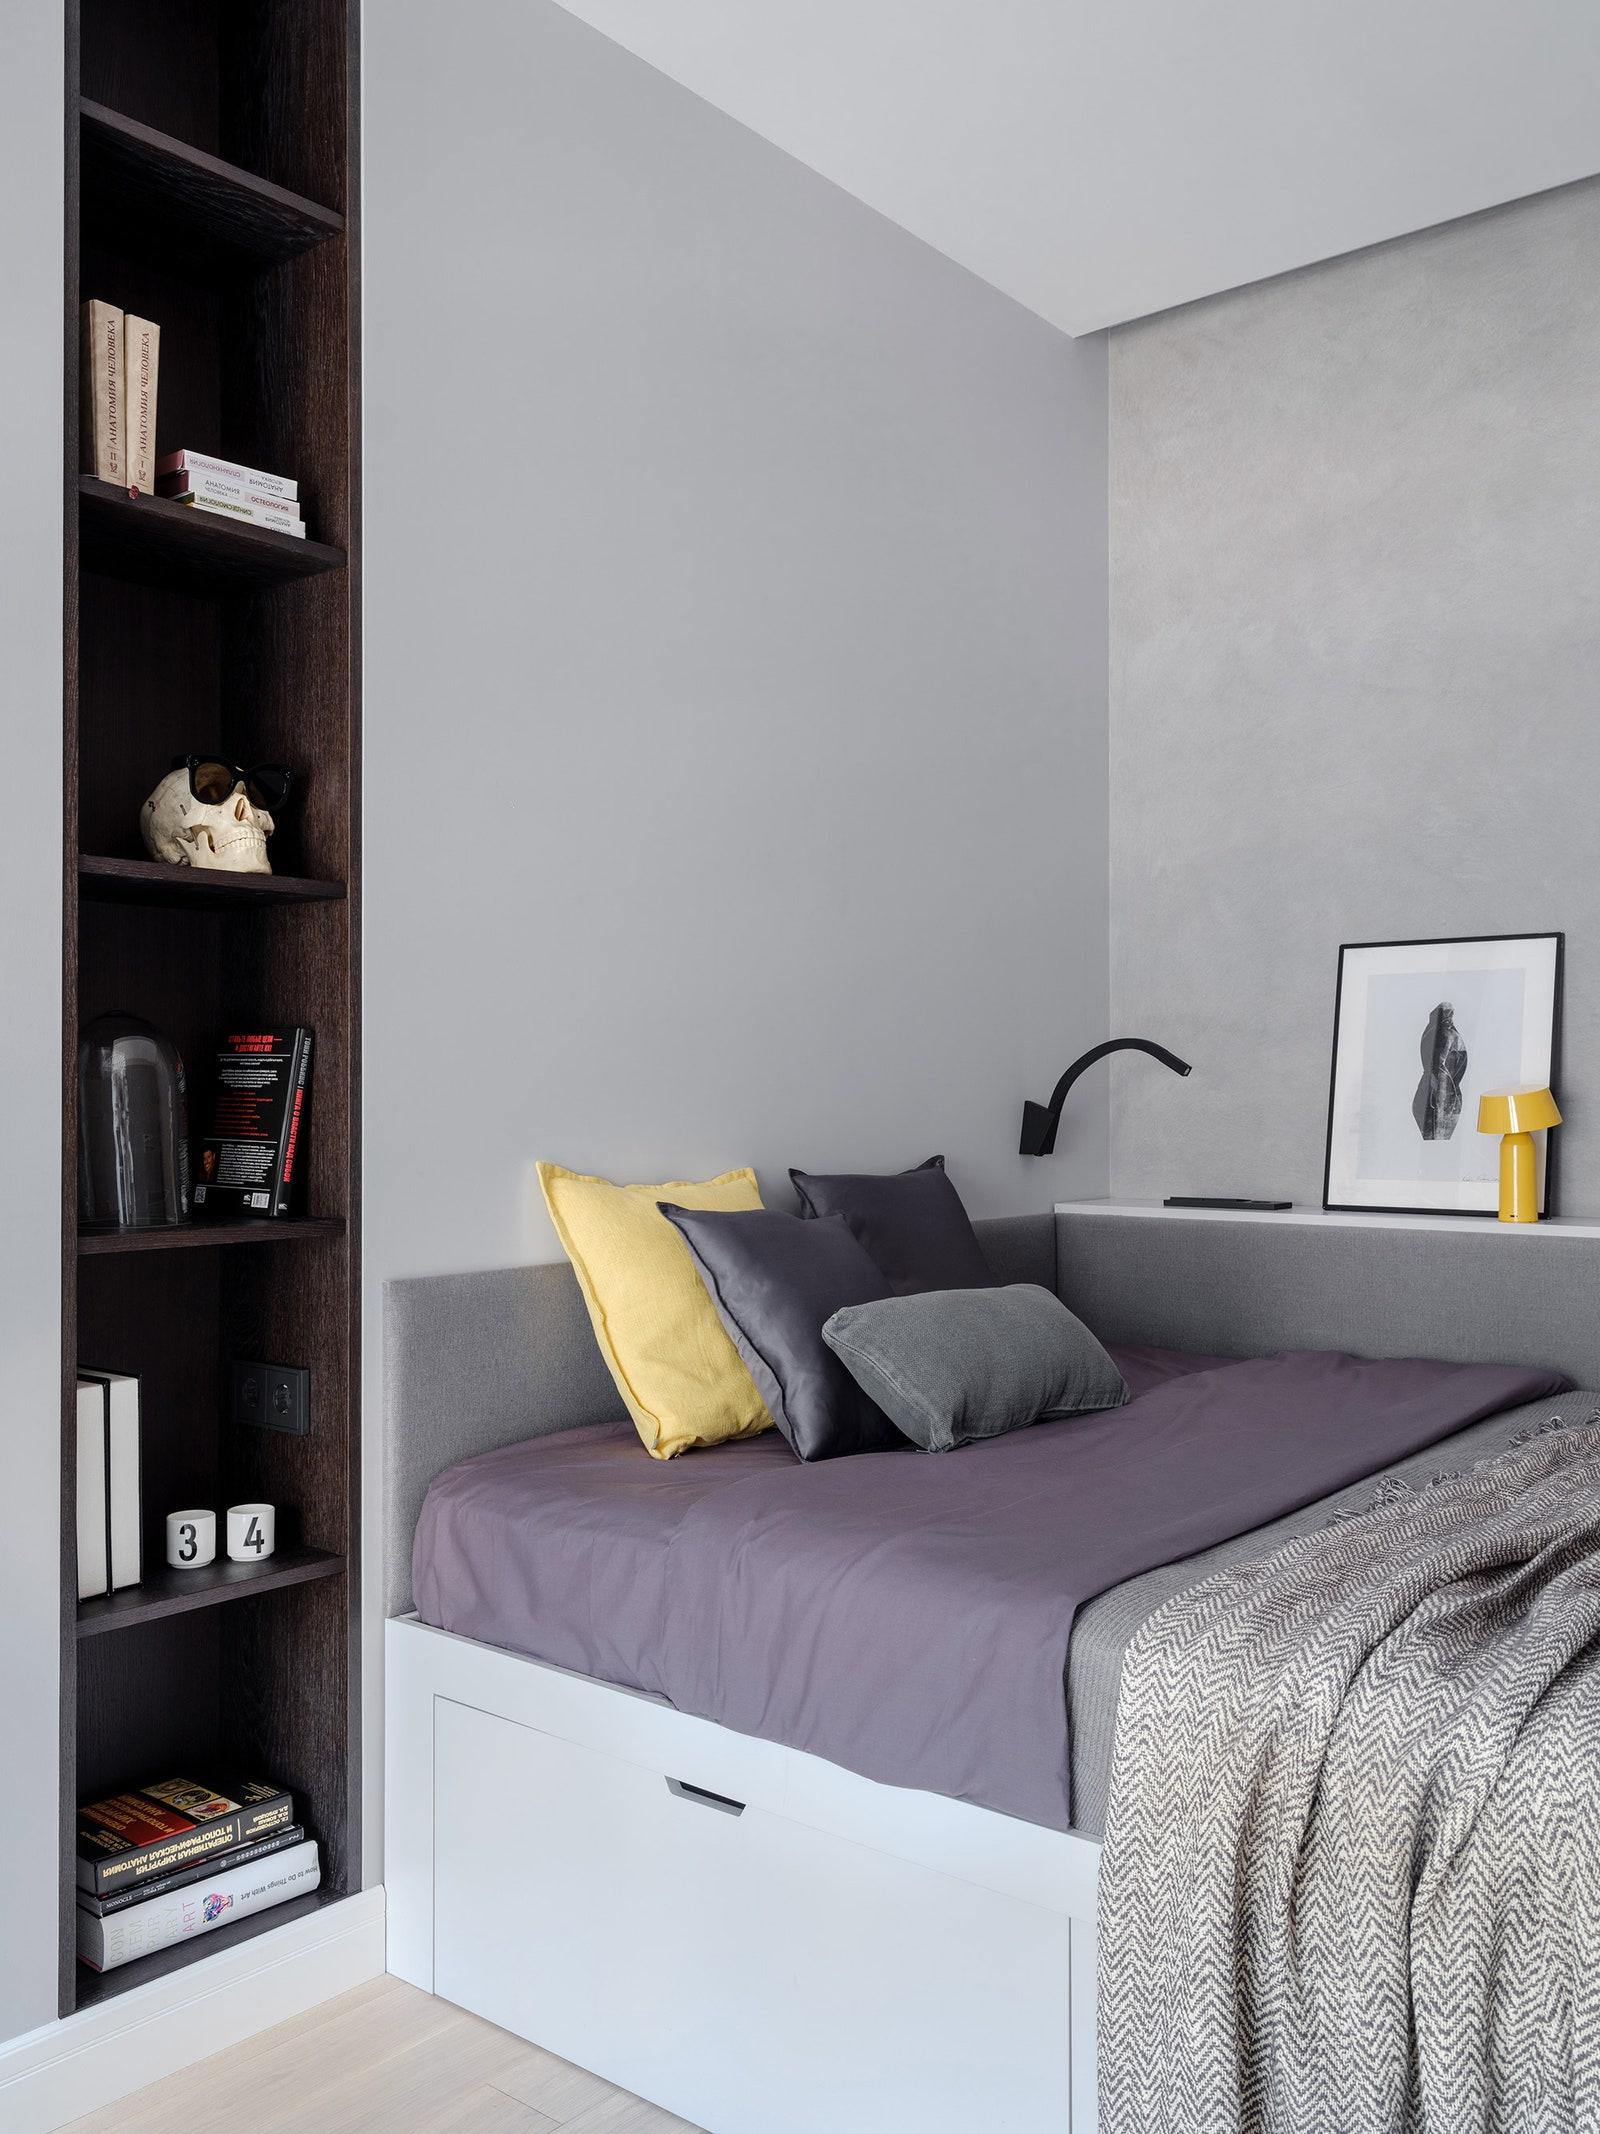 The Derevo.  SnakeW3 Linea Light Group  Barcelona Design  Zara Home    .